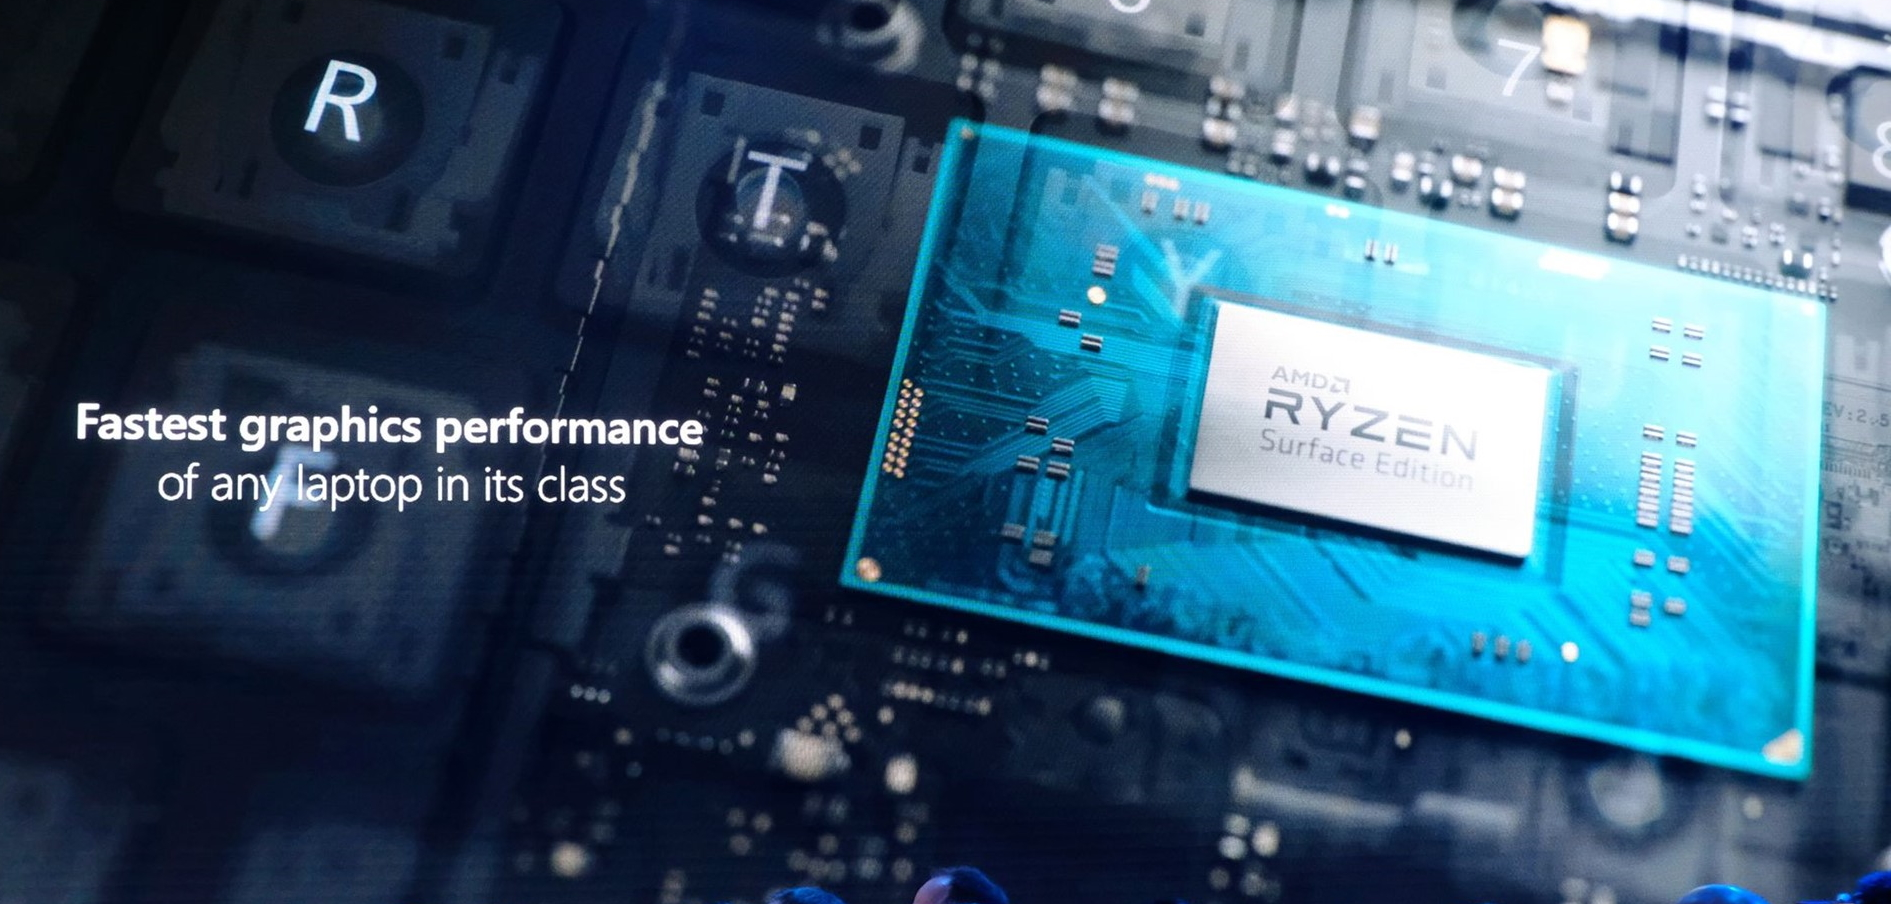 AMD Ryzen Surface Edition